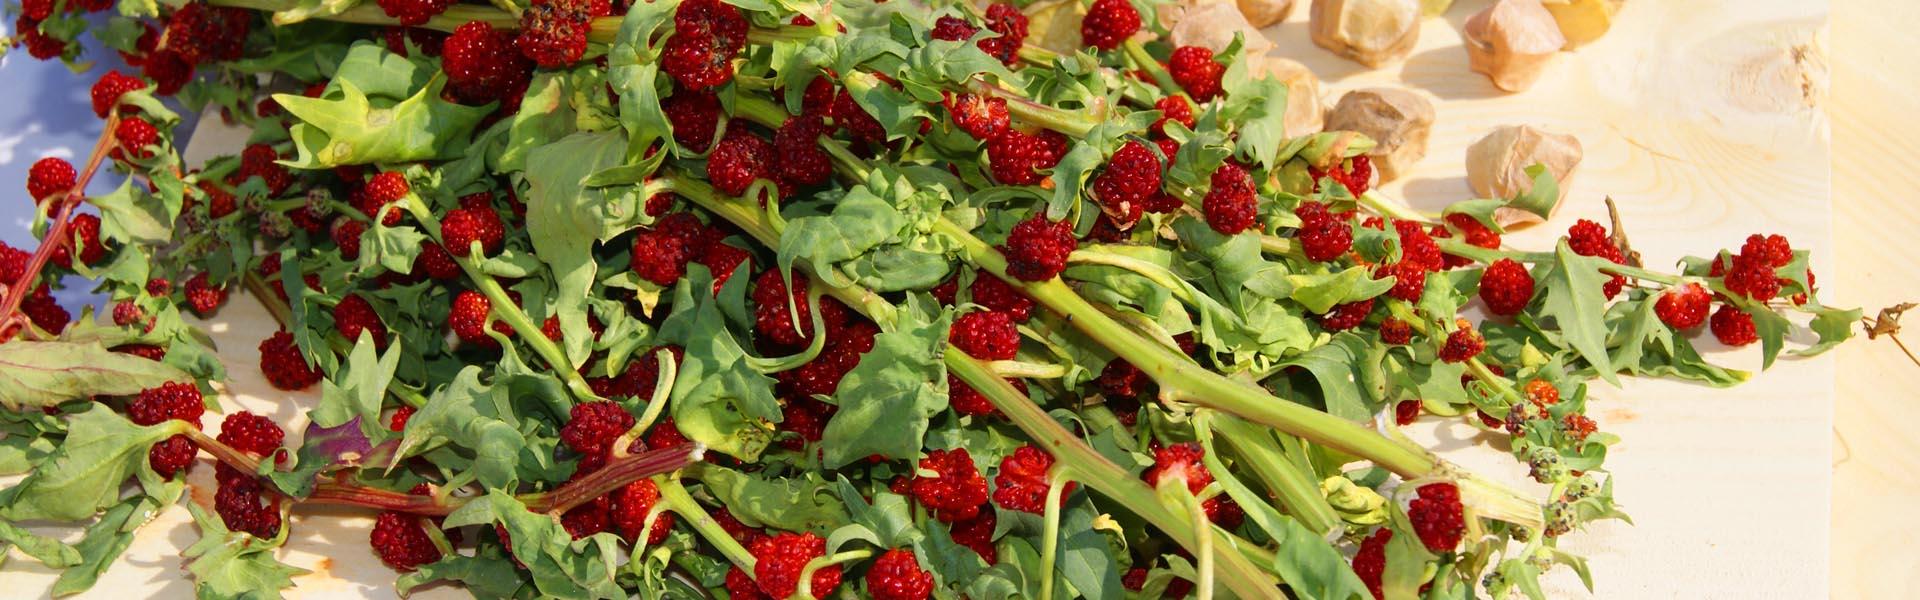 Erdbeerspinat  / Spinaci fragola